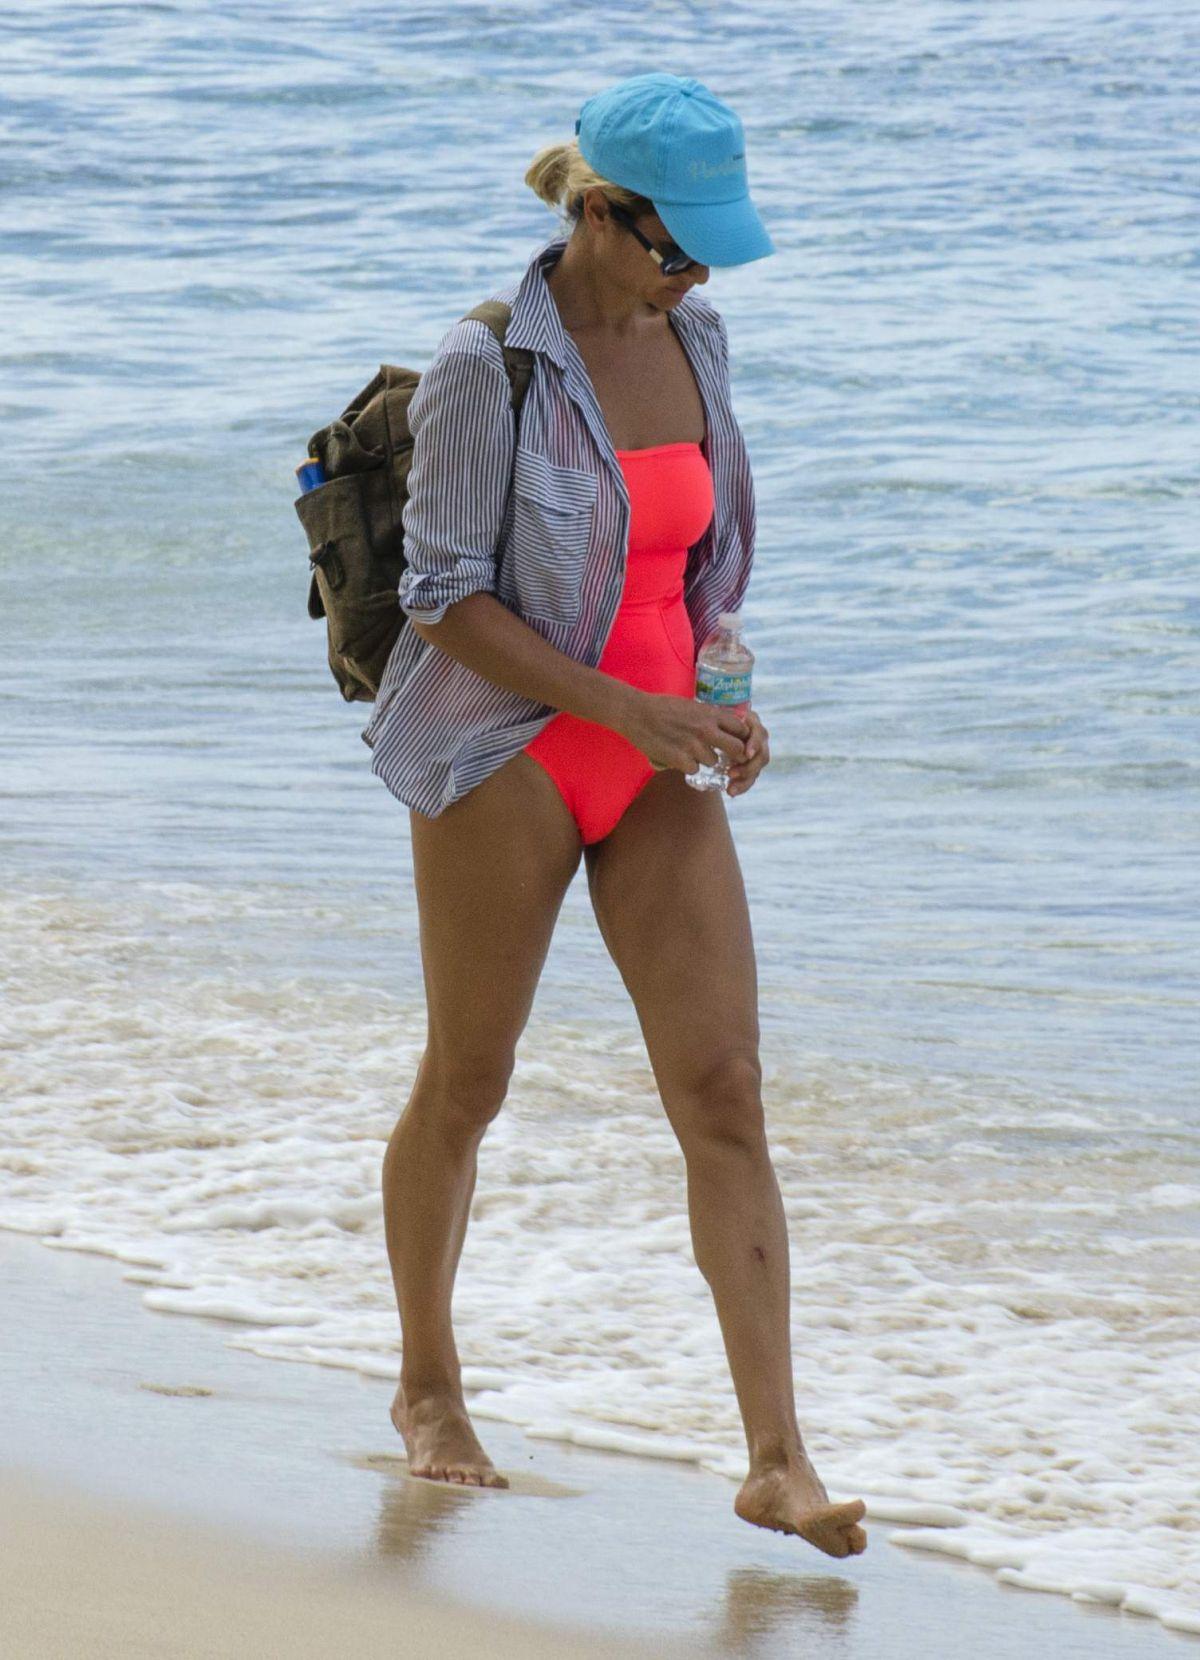 NATASHA SHISHMANIAN on the Beach in Barbados 01/01/2017